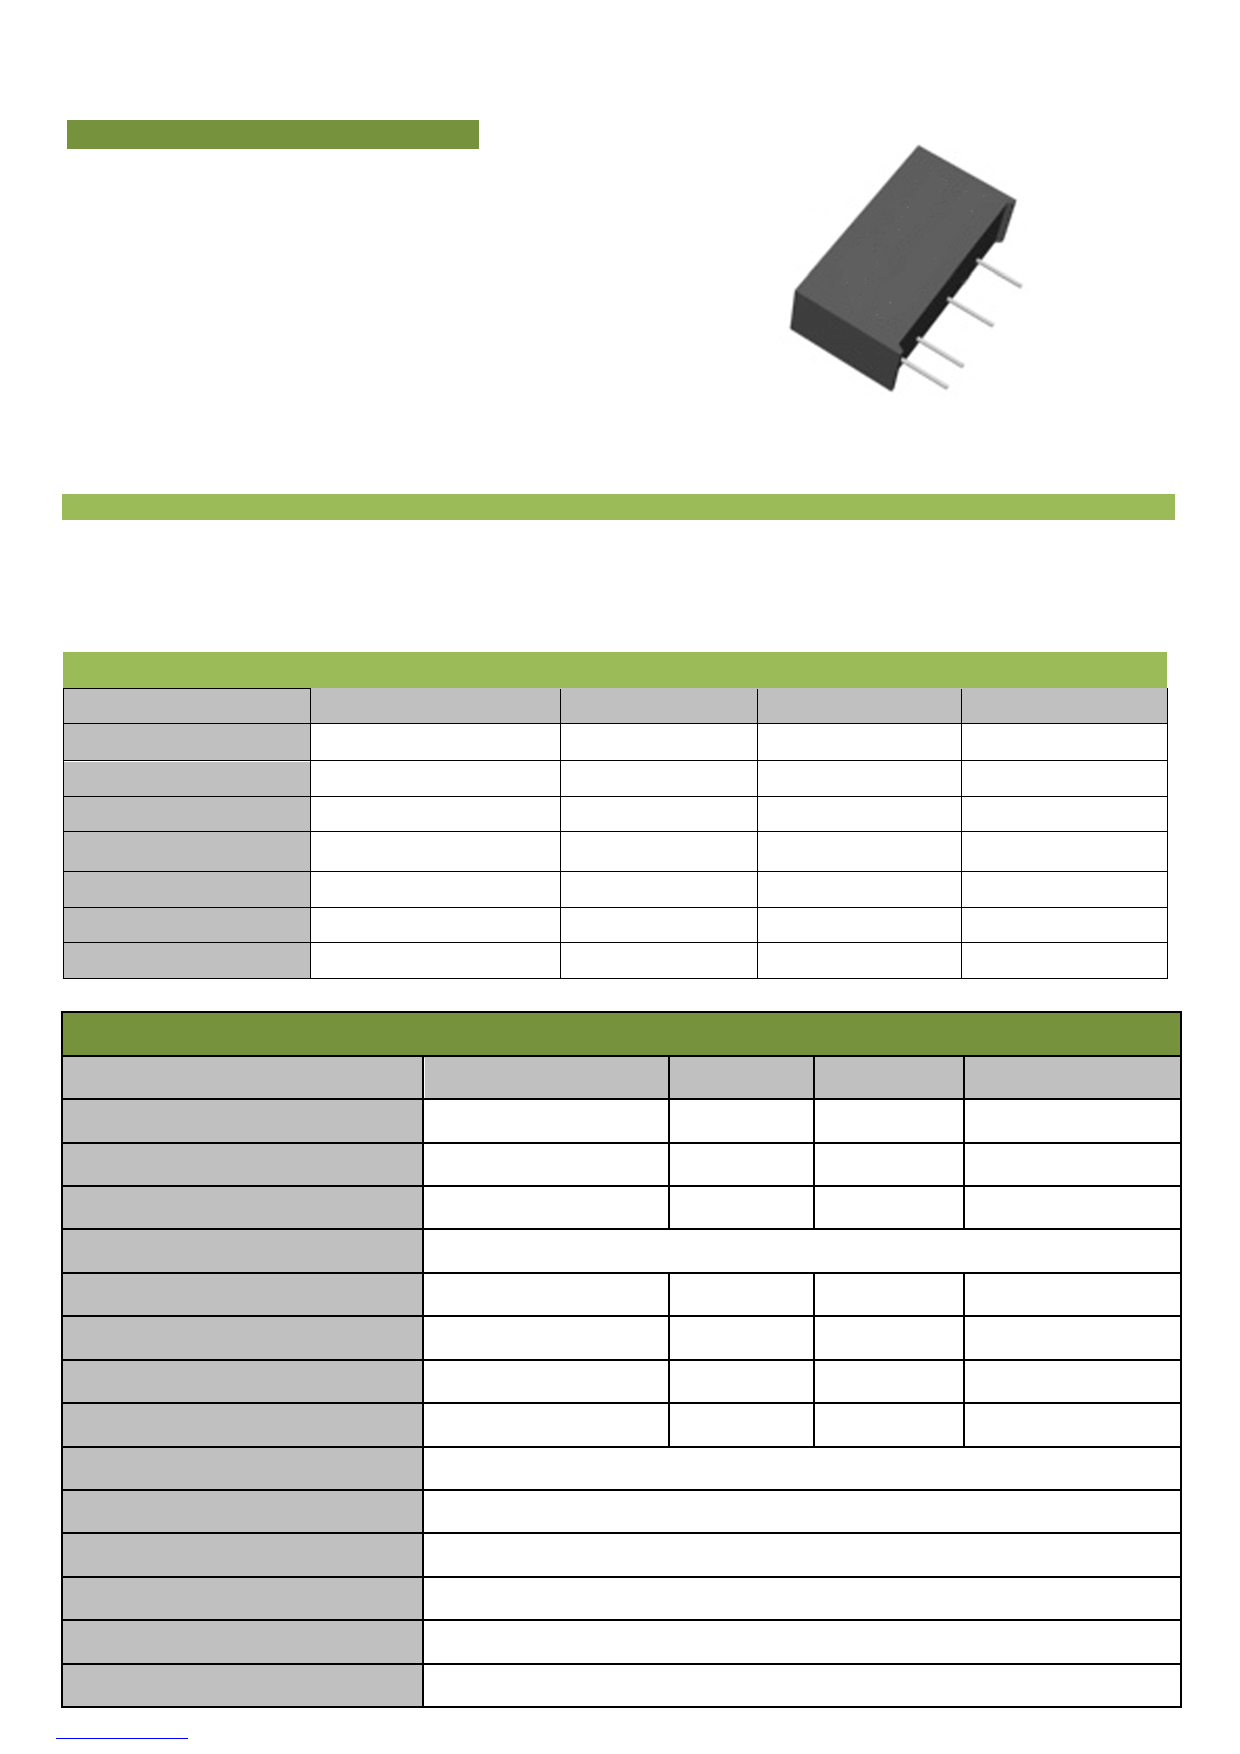 B0524LS-1W datasheet